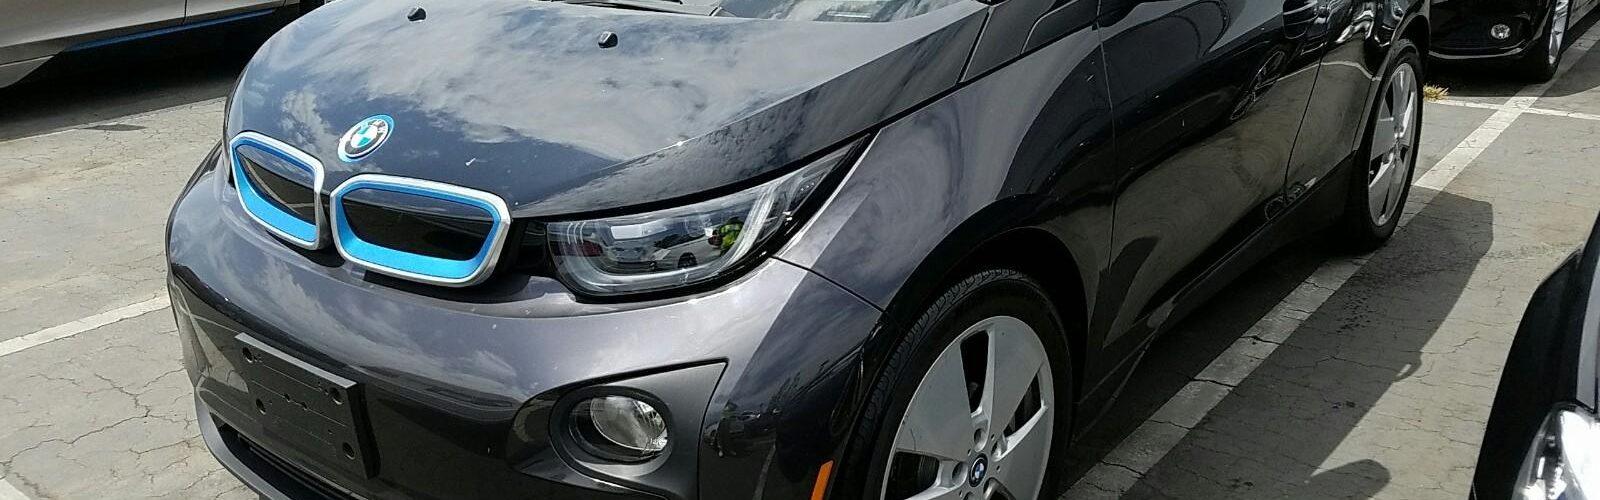 BMW i3 MEGA 2015 – 34 126 Km – Seulement 26 371 $ avec la subvention – VENDU